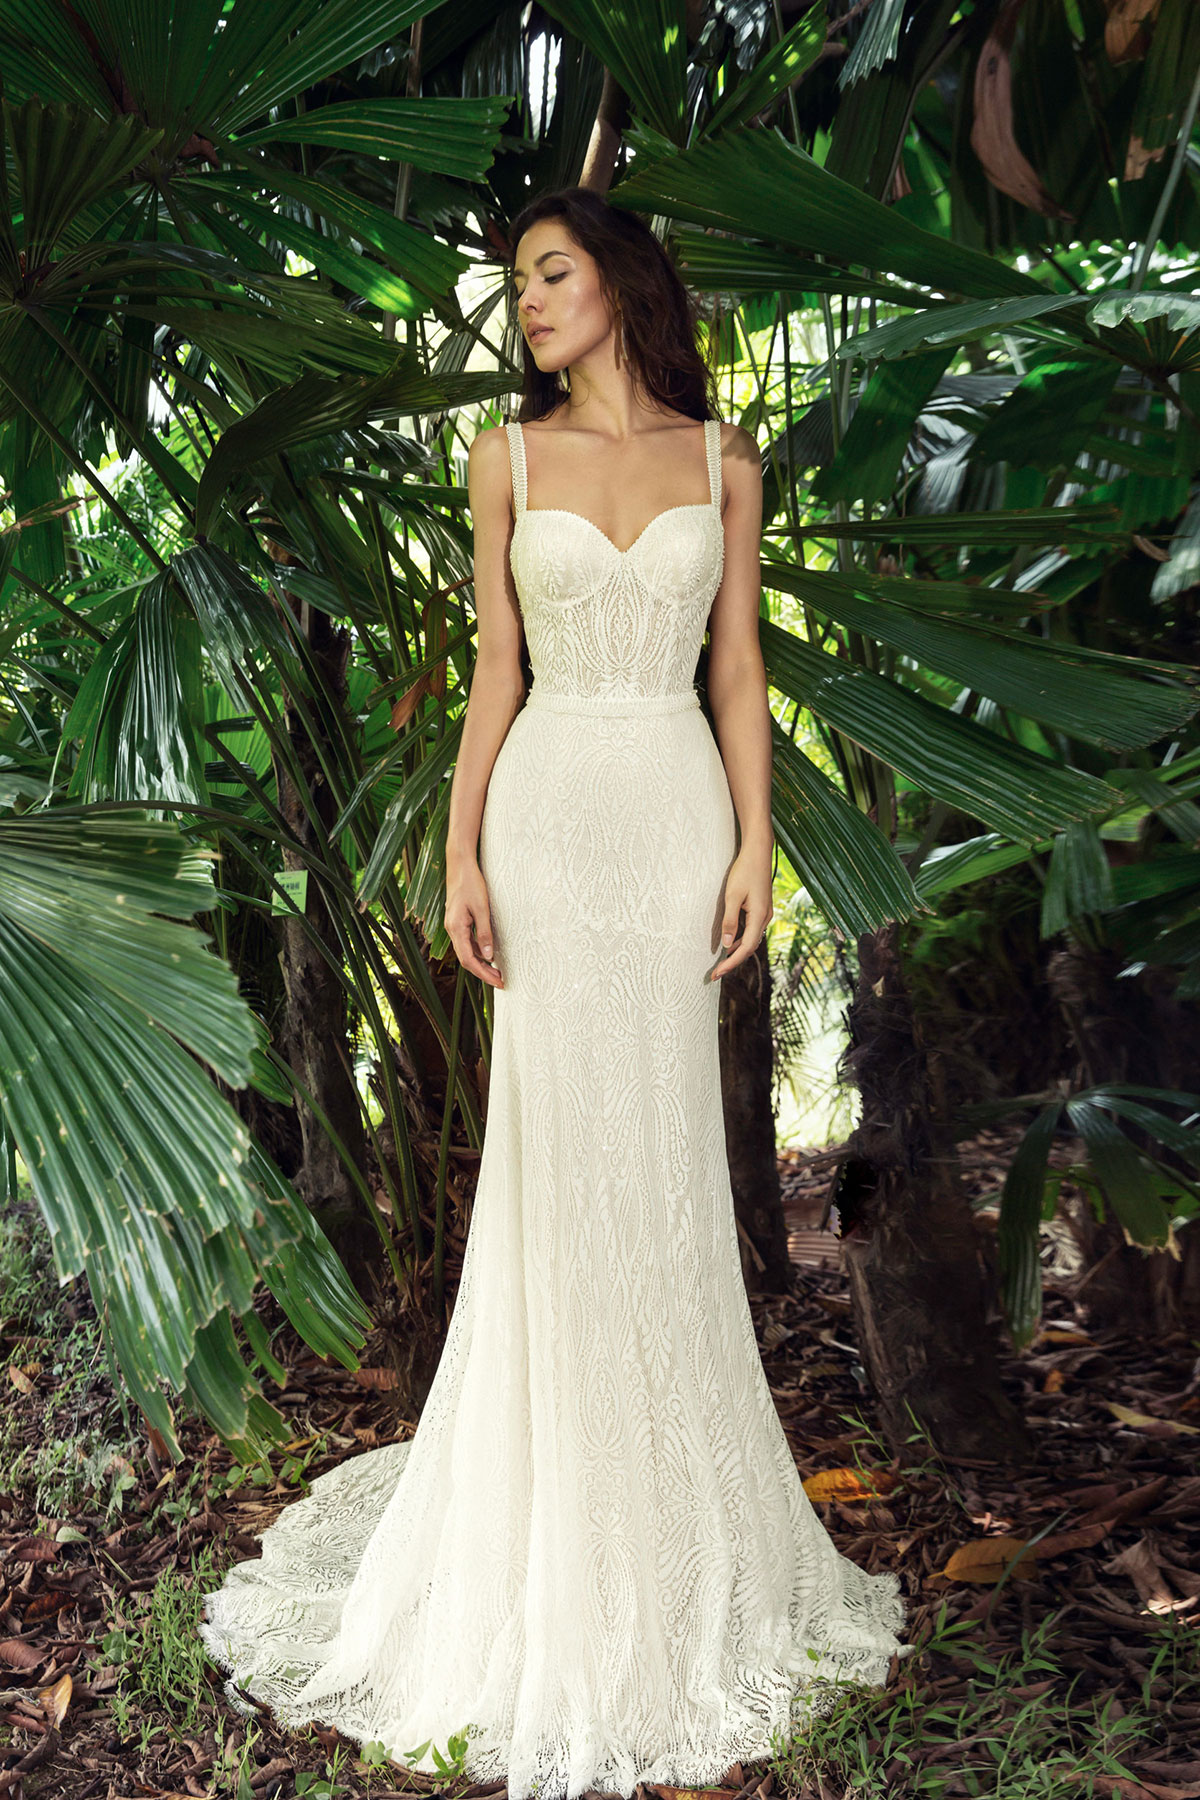 Wedding dress details - Raven at Hannah Elizabeth Bridal by Nostalgia by Amber He